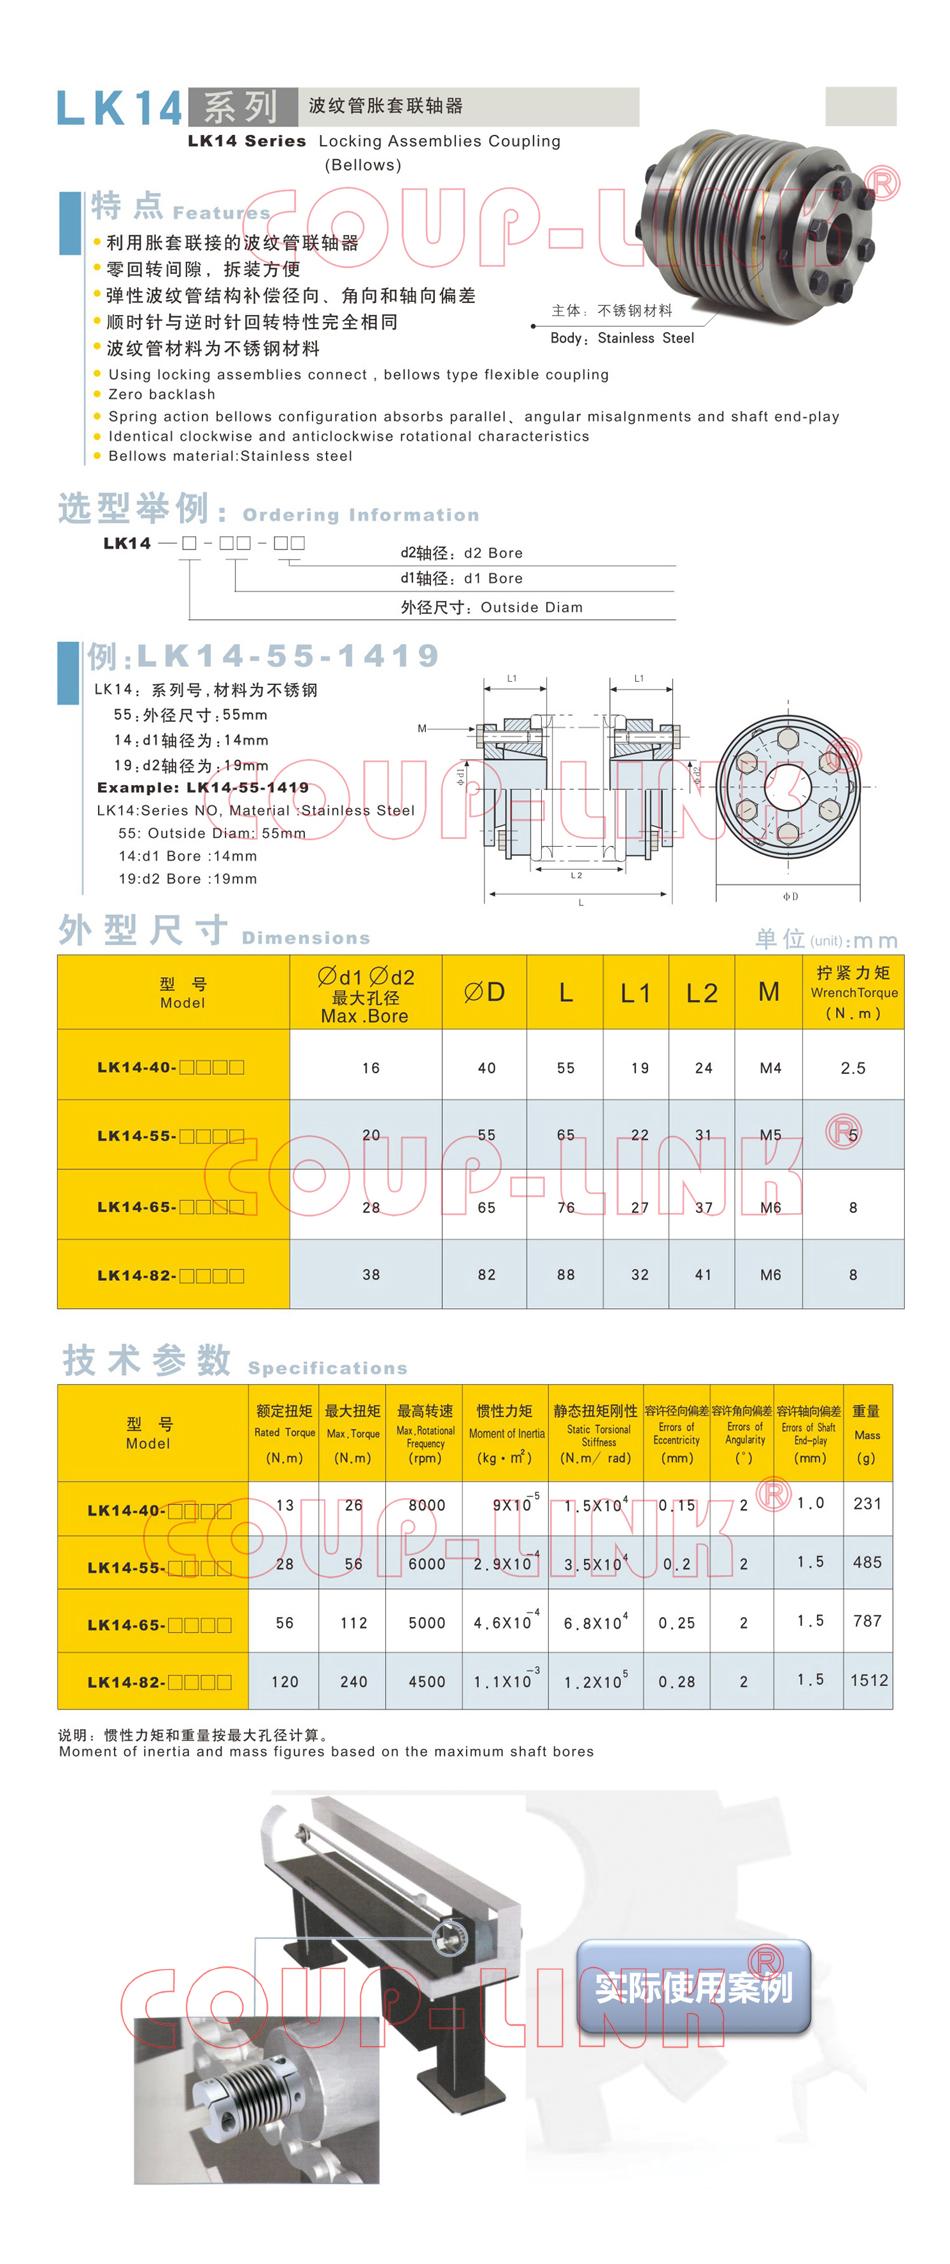 LK14系列 波紋管脹套老子有钱app_老子有钱app種類-廣州老子有钱自動化設備有限公司